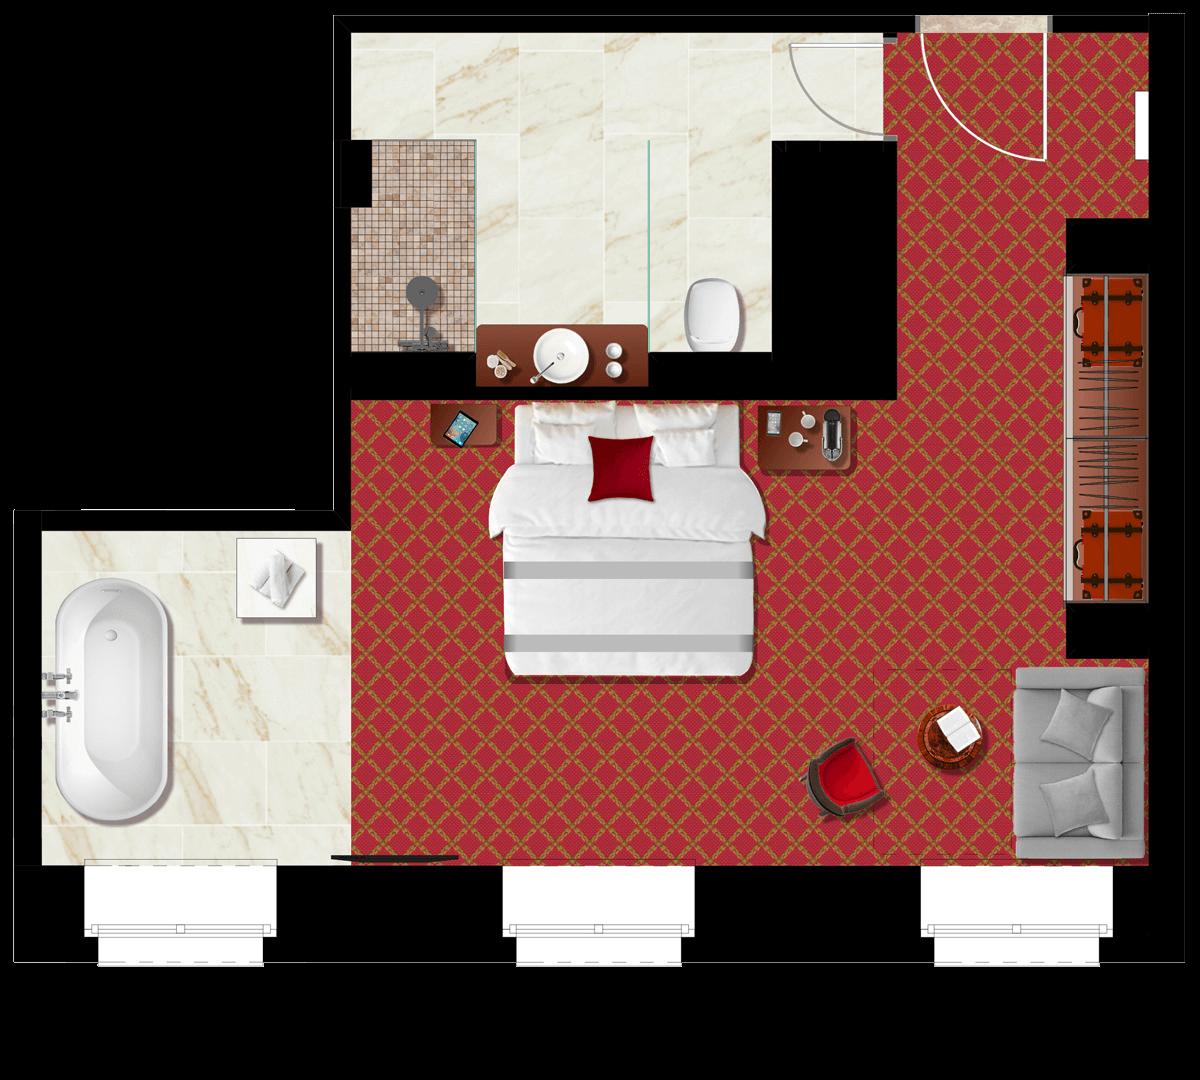 Studio Lakosztály alaprajz - Mystery Hotel Budapest